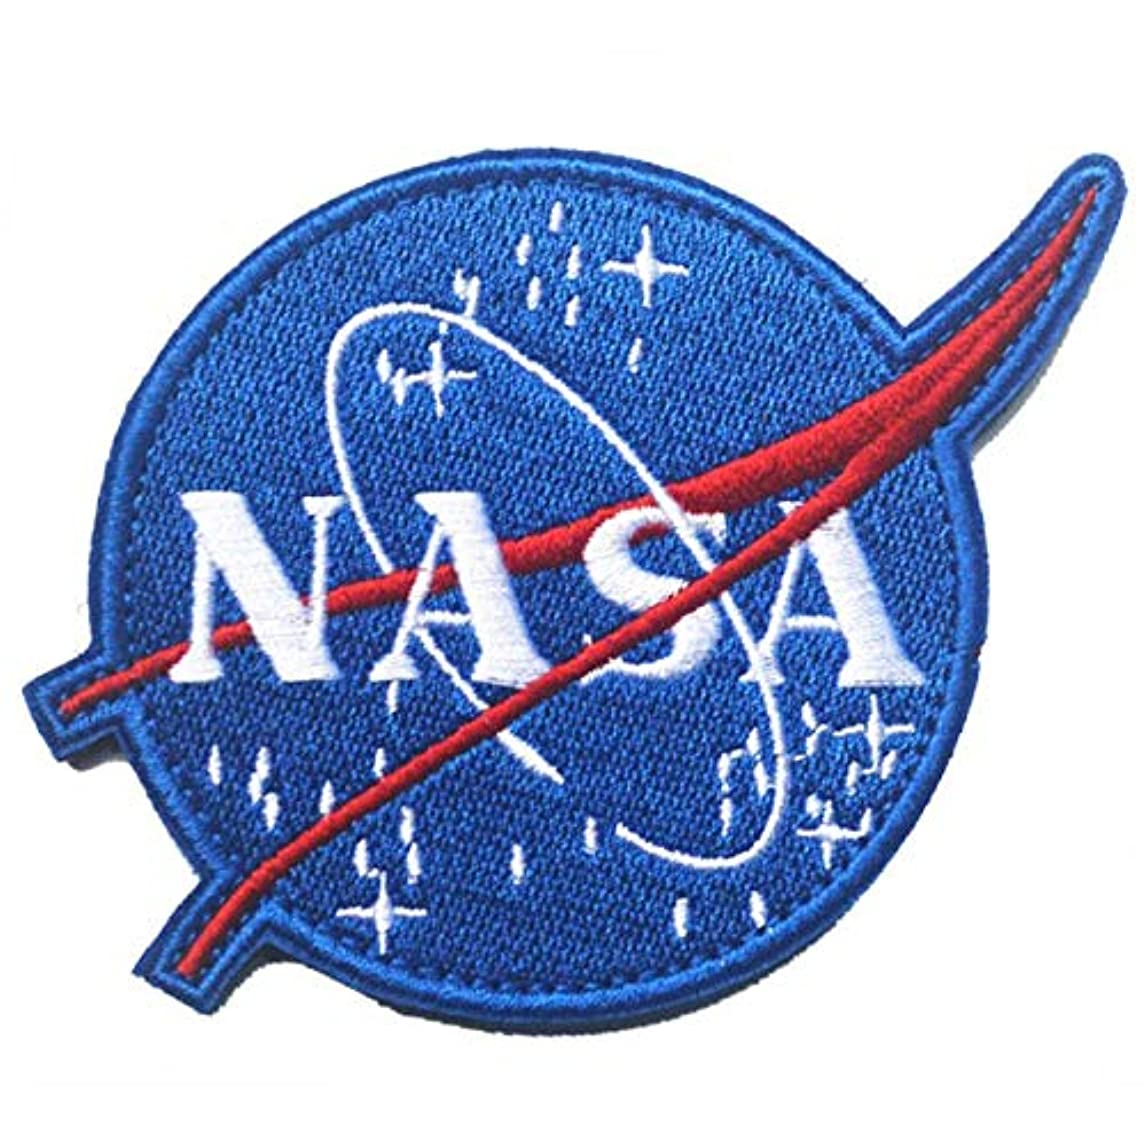 OYSTERBOY NASA National Aeronautics and Sace Administration Meatball Patch (Iron-on)